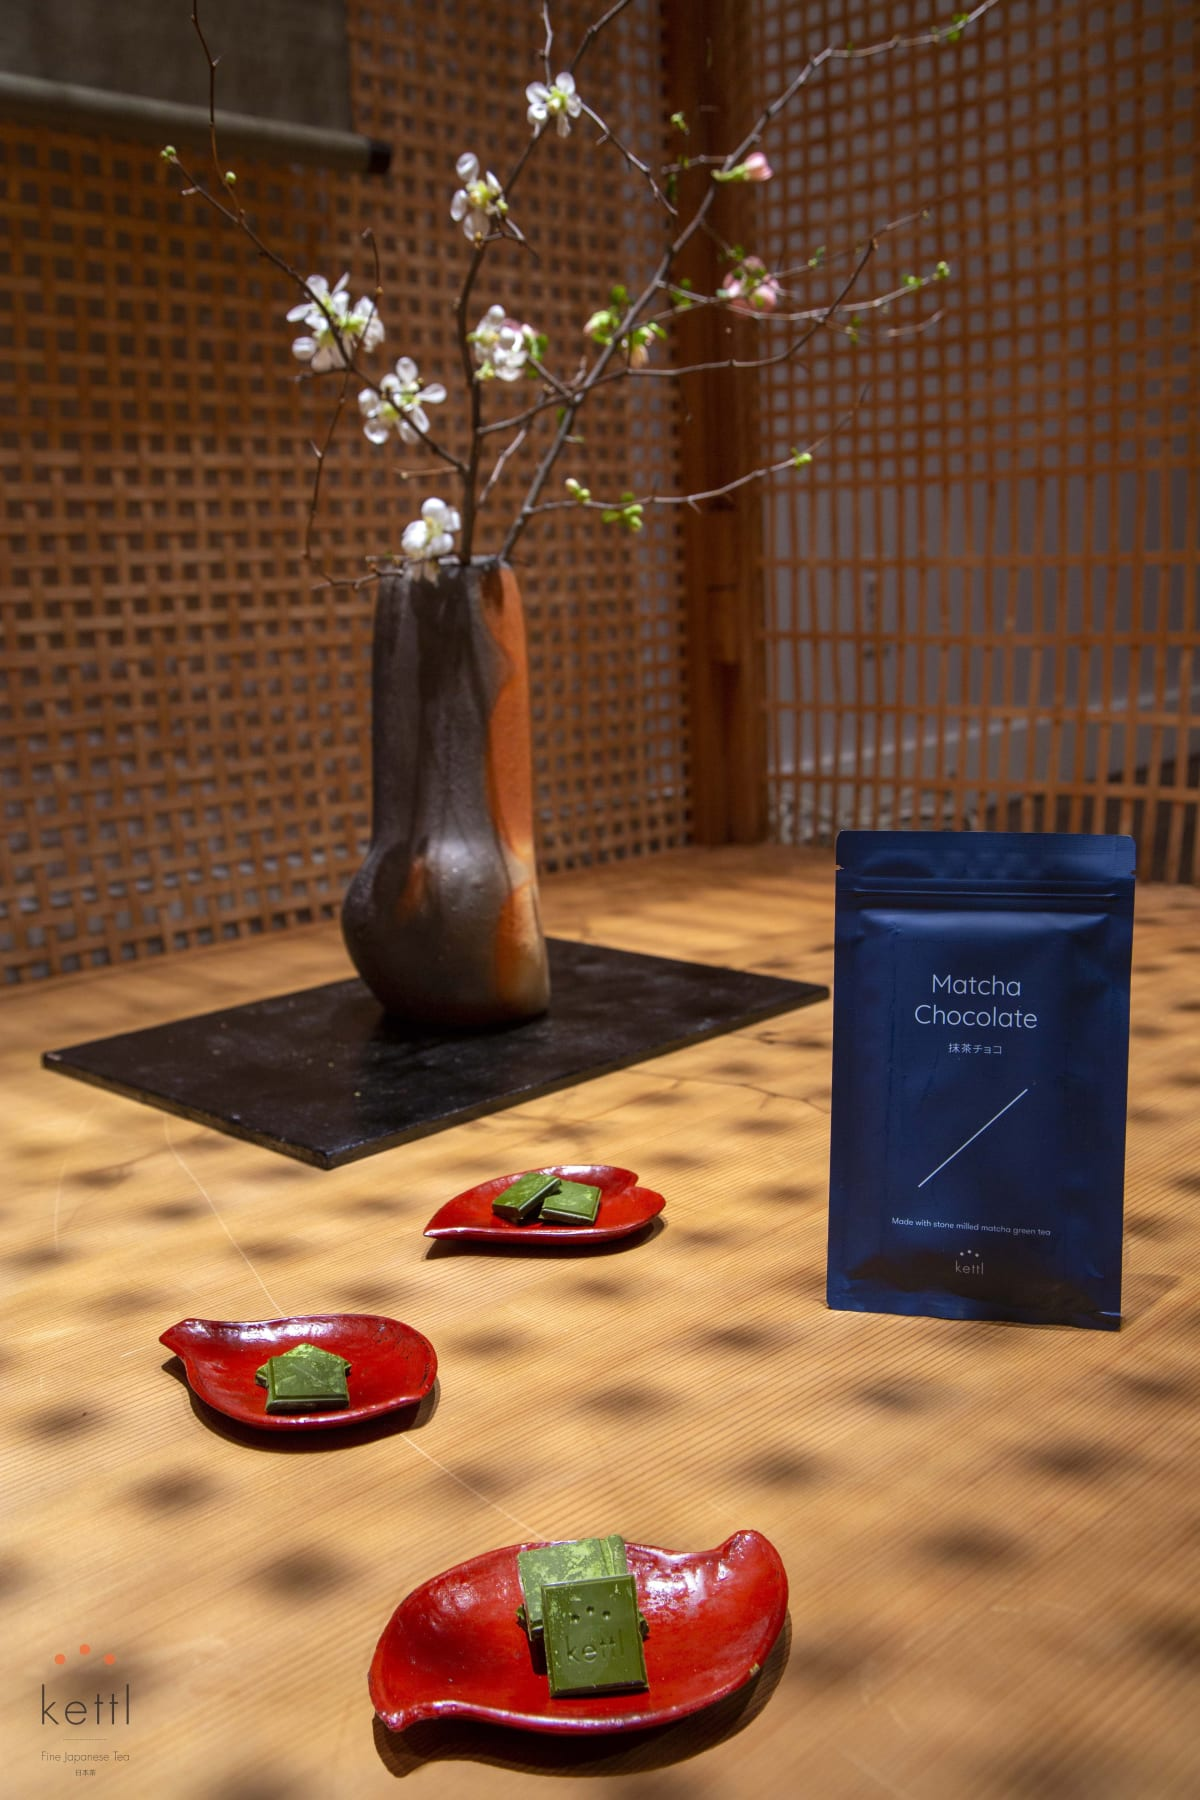 Kettl Contemporary Tea Ceremony